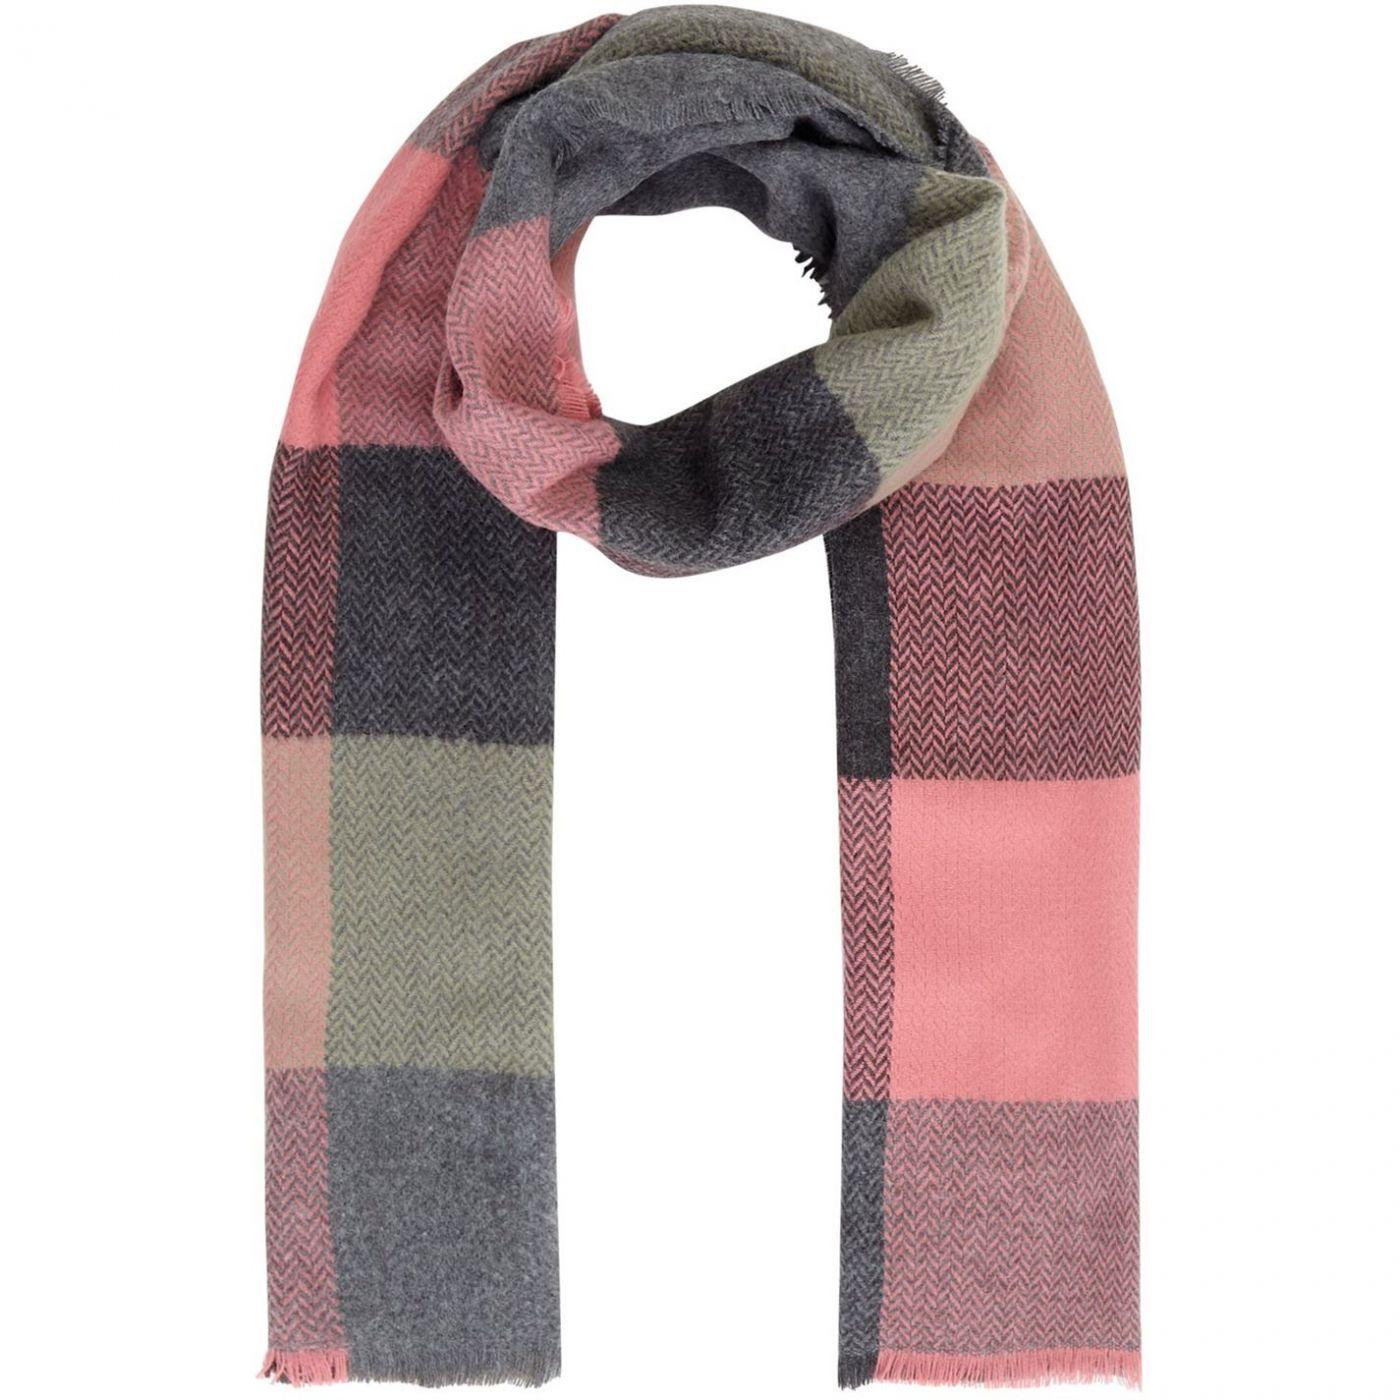 Maison De Nimes Olivia oversized check scarf